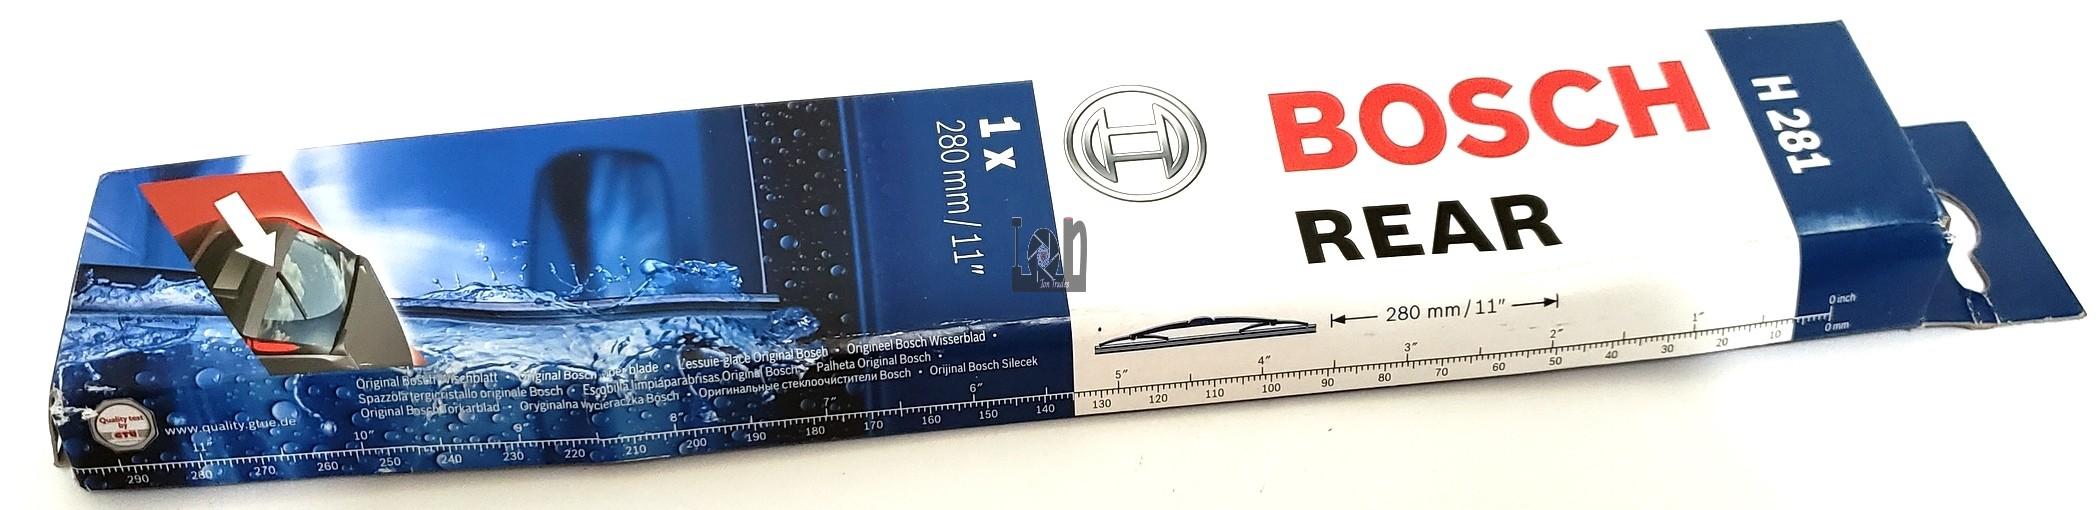 "Bosch Rear Wiper Blade H281 11"" Replacement"